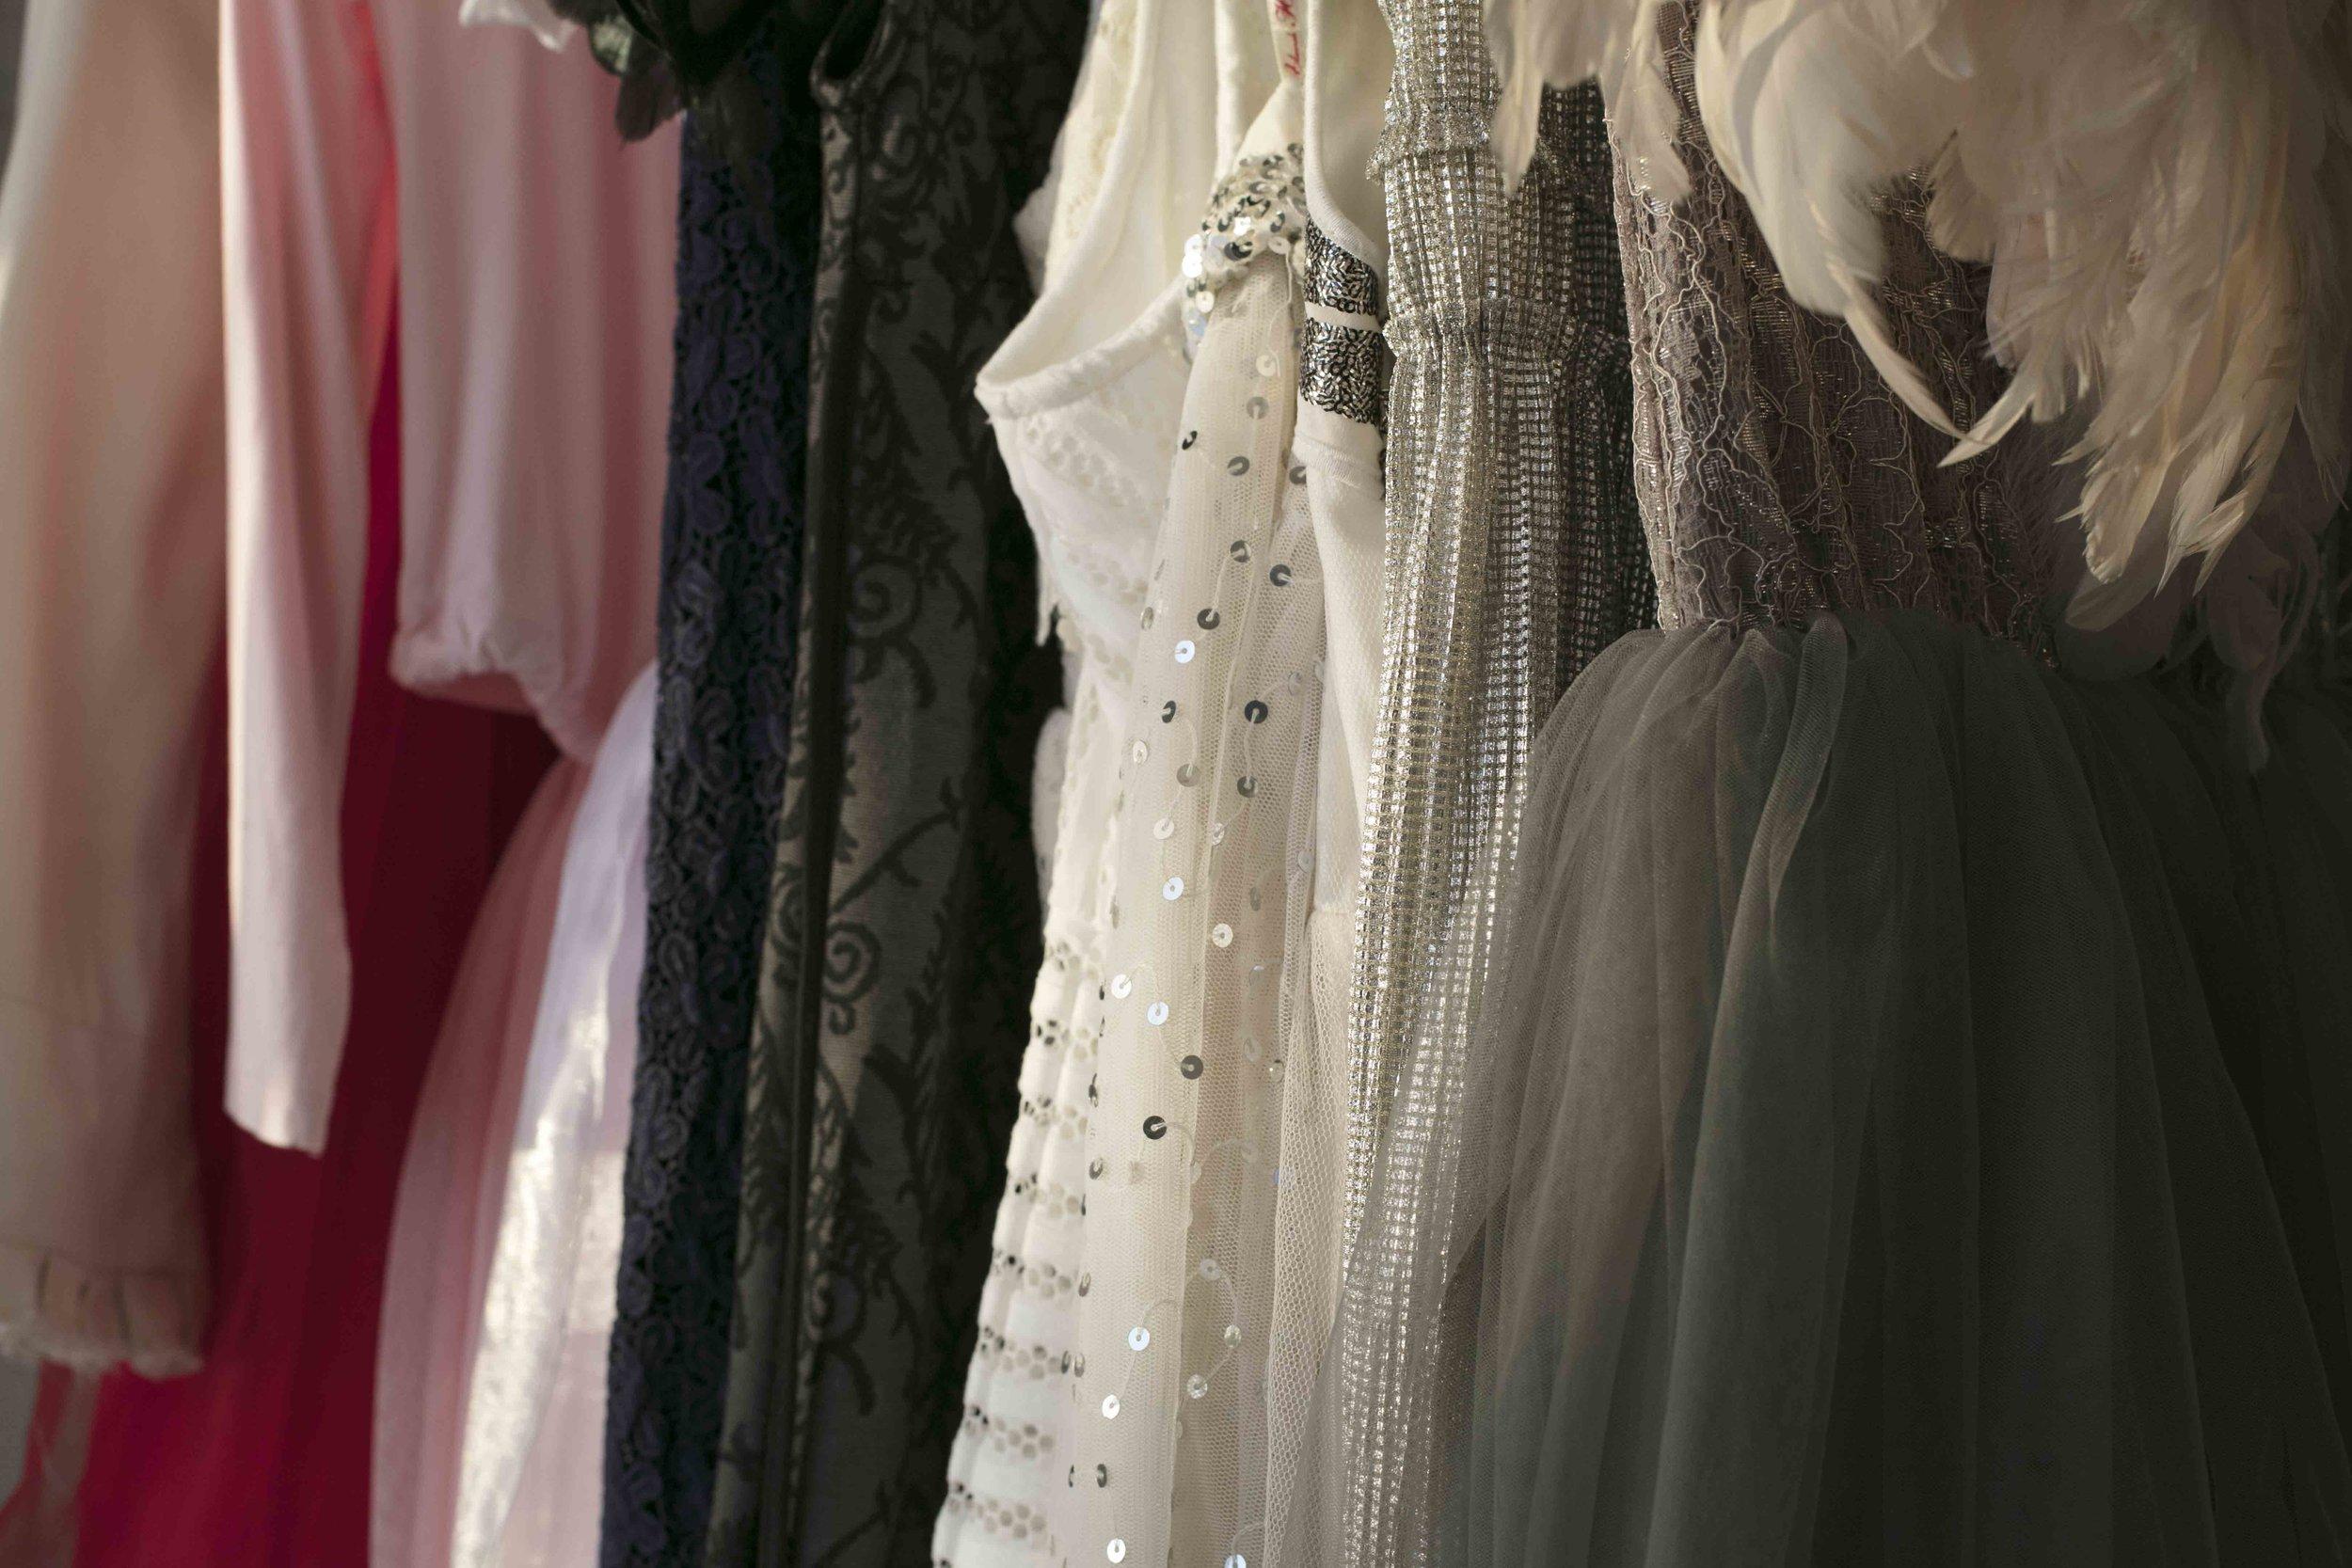 marina-mcdonald-portrait-photography-designer-dresses